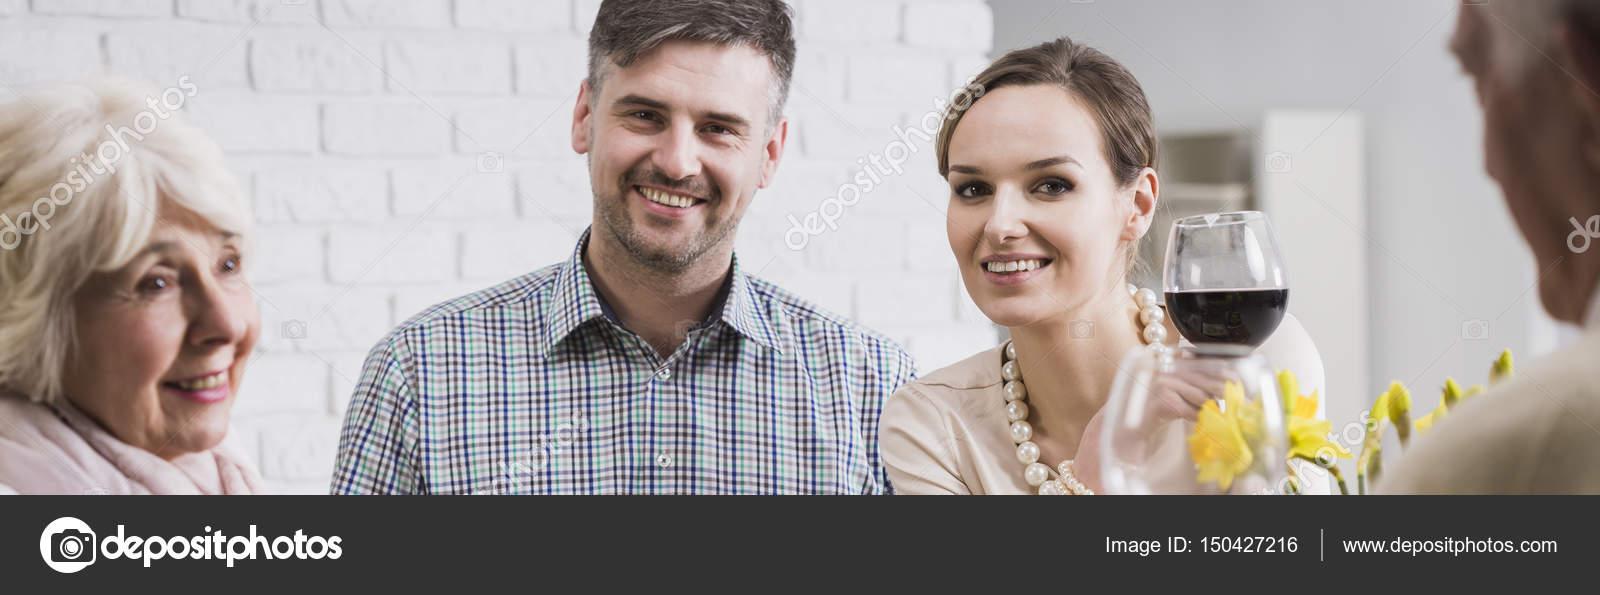 gratis più giovane per anziani dating online incontri Österreich test